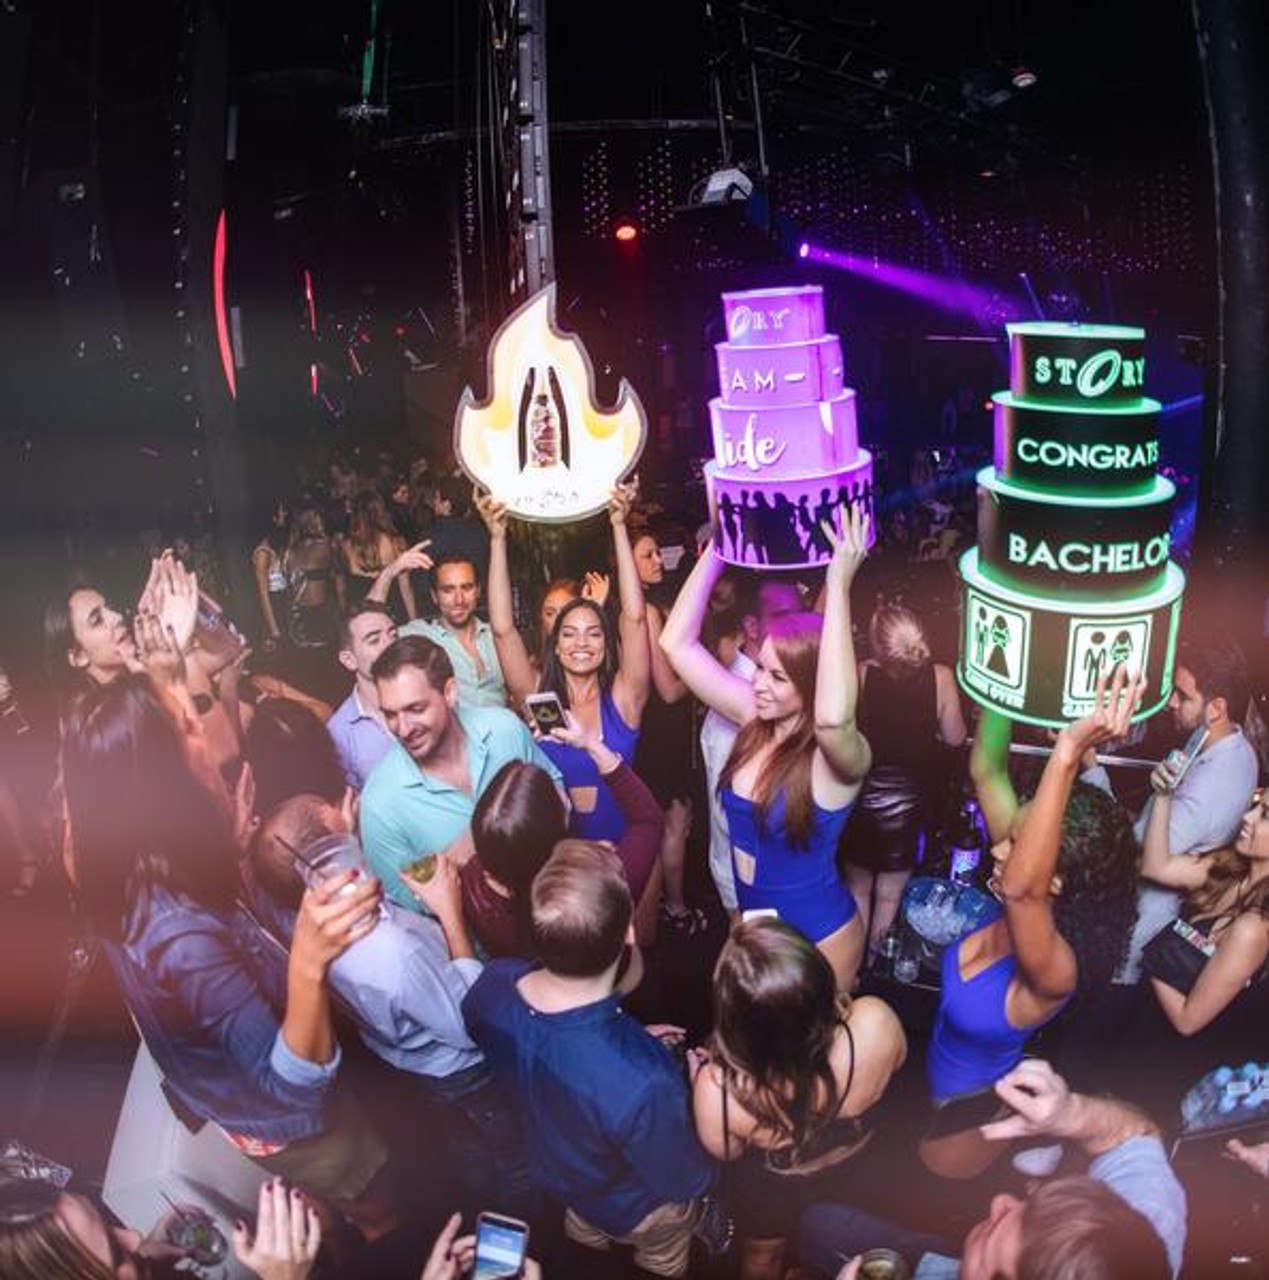 Presenters, Bottle Carrier, Liquor Holder, VIP, LED Cake, LED Flame, Nightclub, Venue, Bar, Casino, Lounge